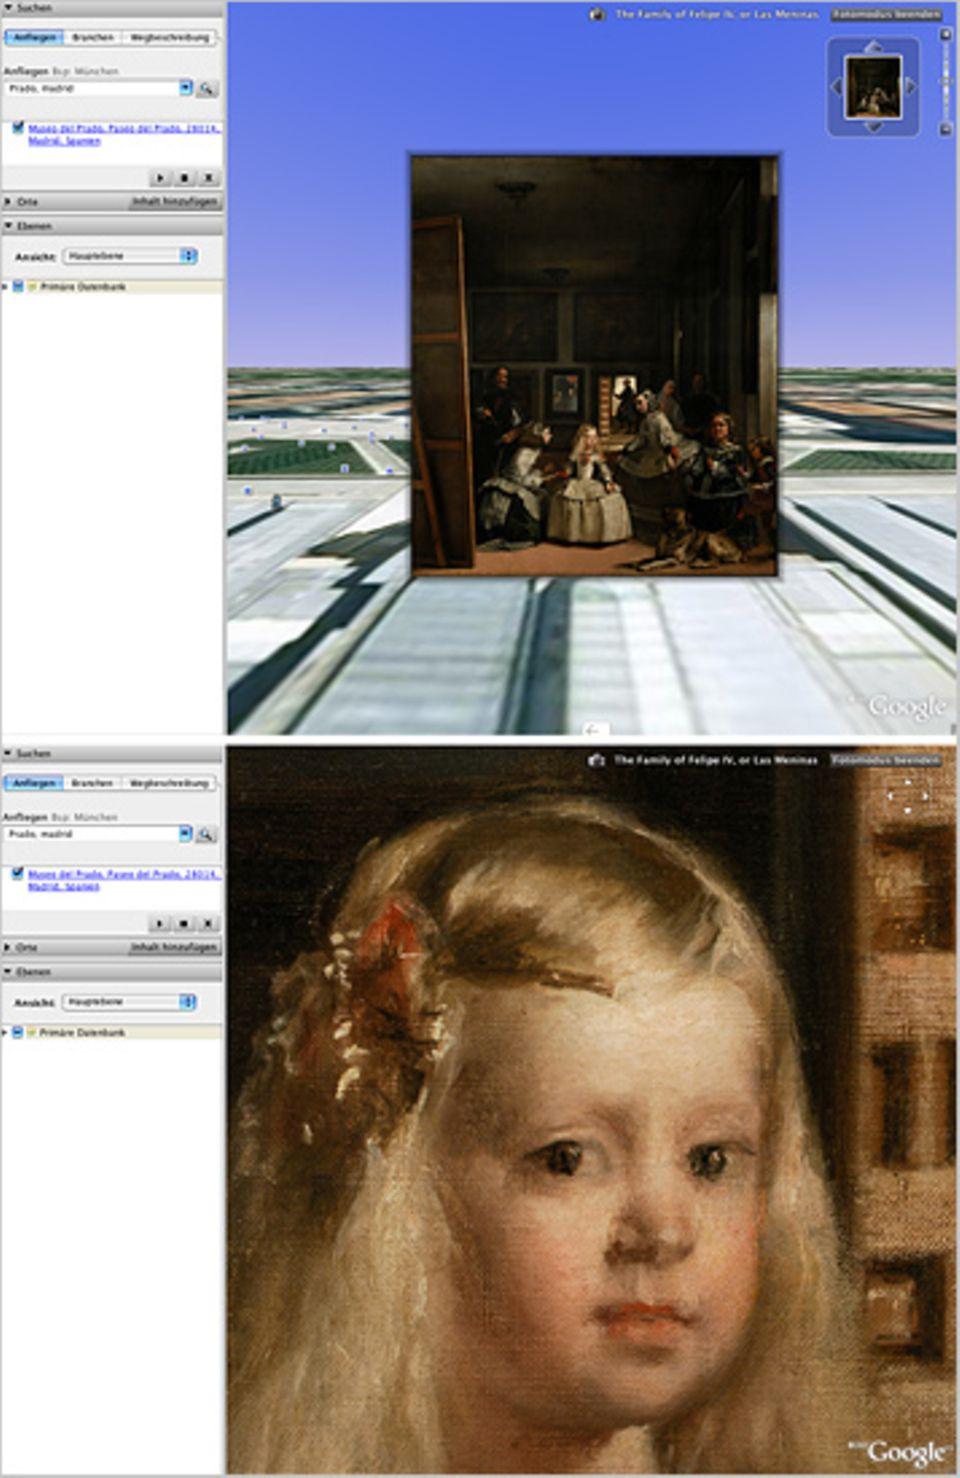 Virtuell reisen dank Web 2.0